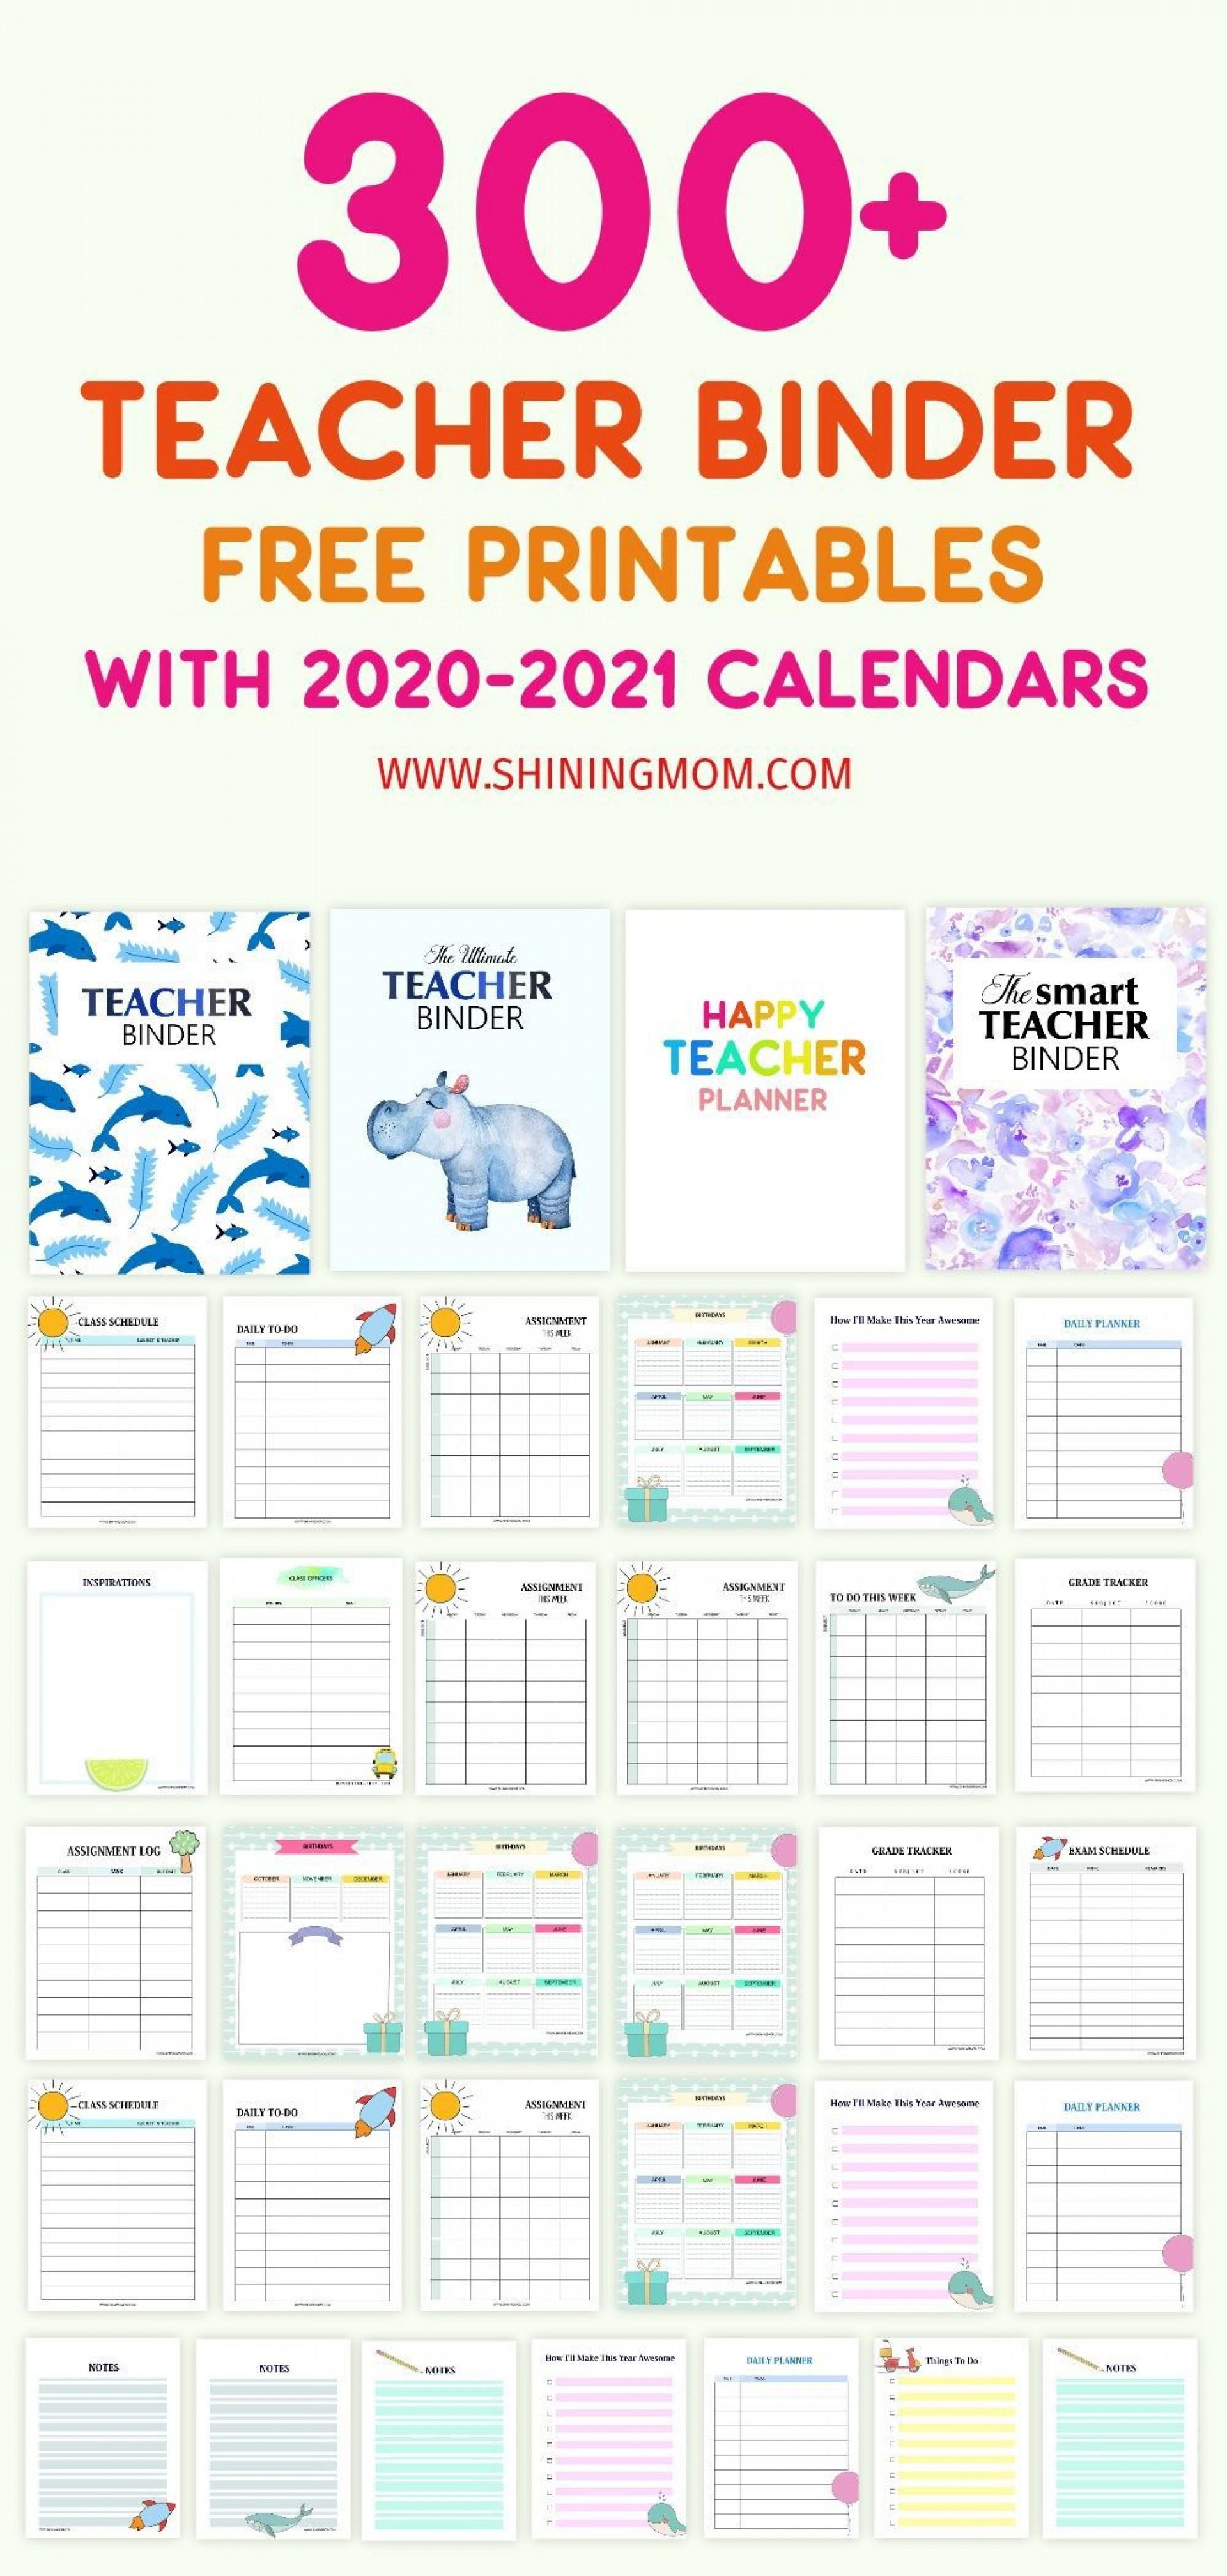 000 Sensational Free Printable Teacher Binder Template High Def  Templates1920